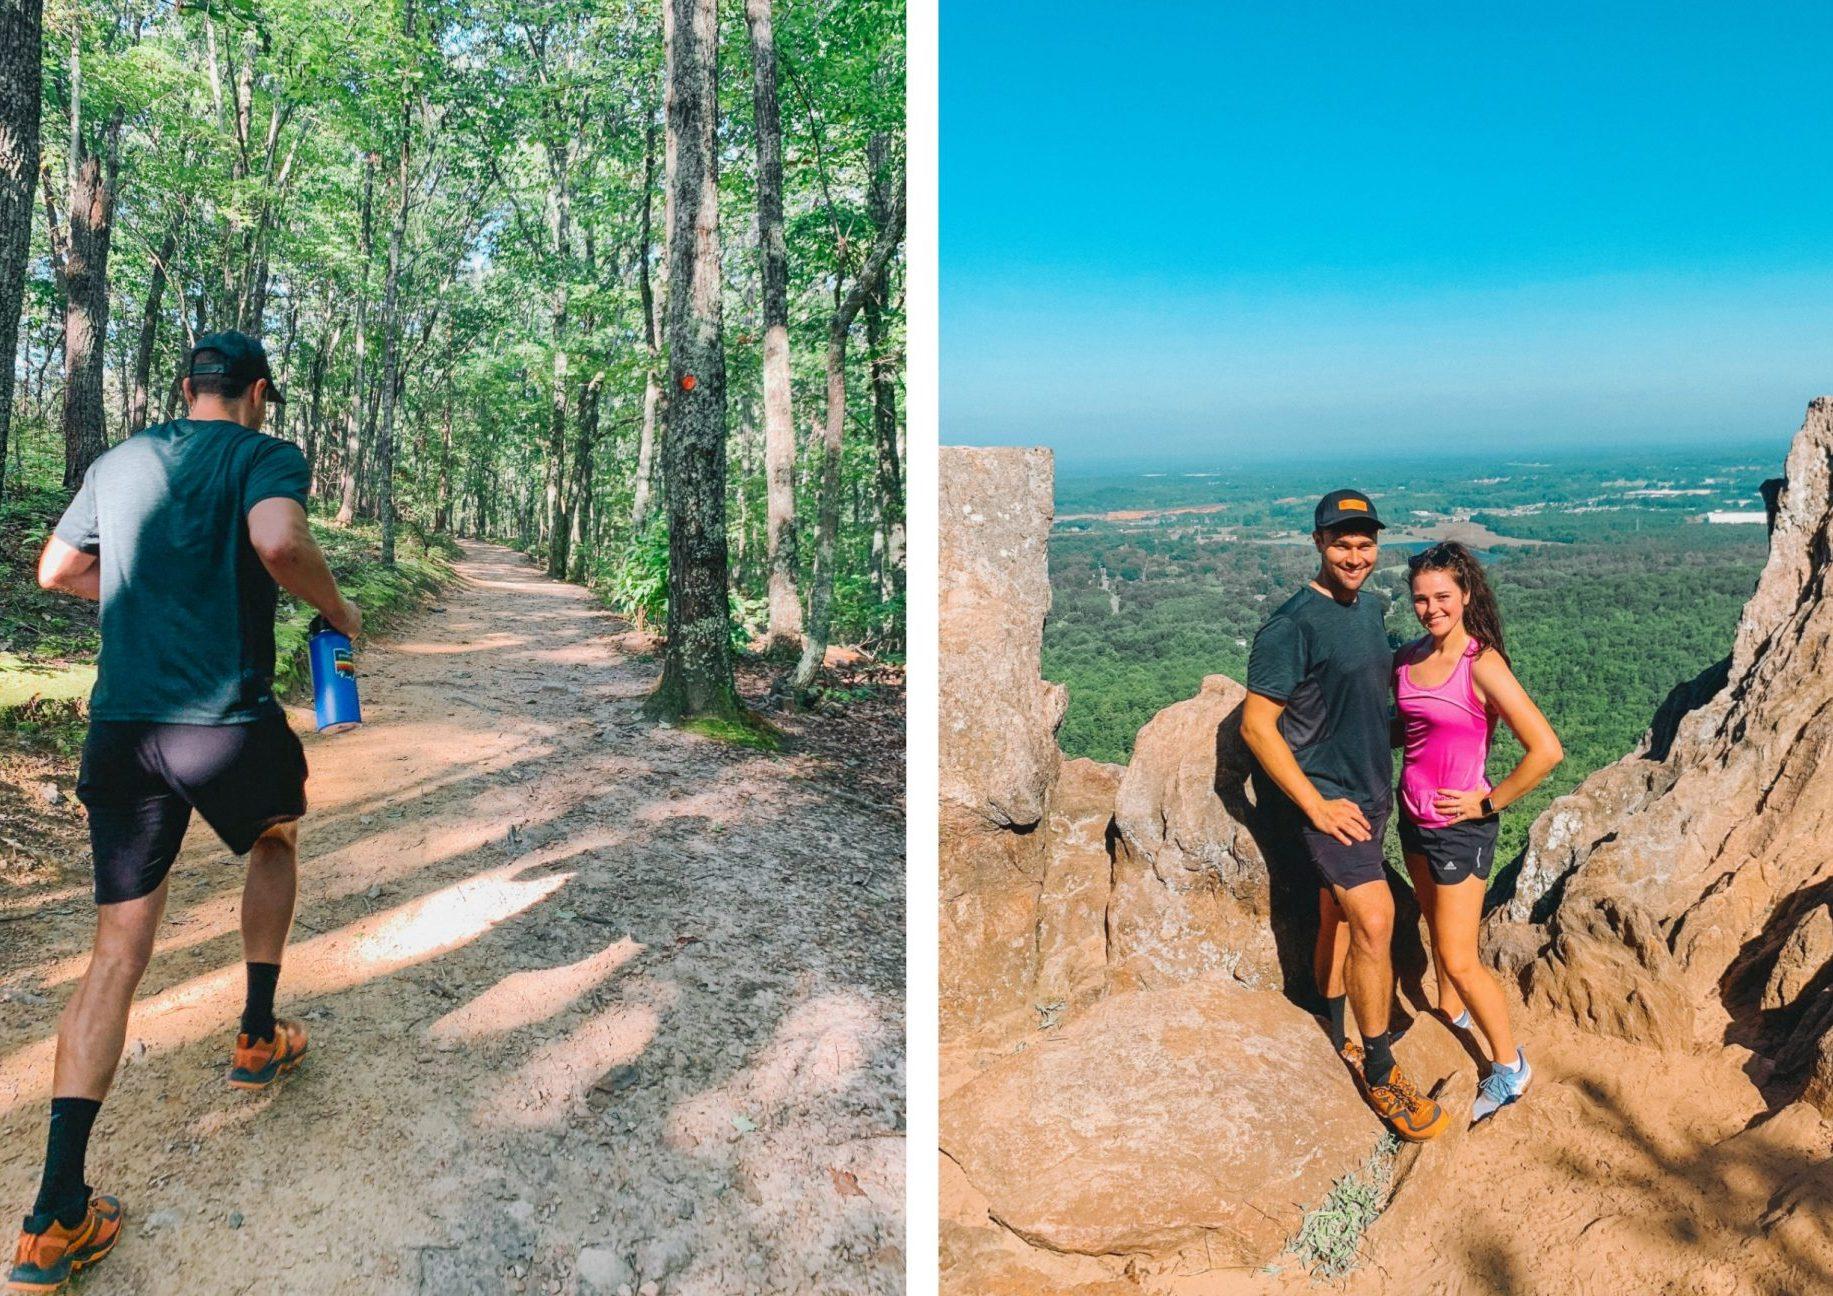 eight and sand, Charlotte, cut, brunch, clt, breakfast, brunch, hiking, southend , crowders mountain hike, pinnacle trail, hiking